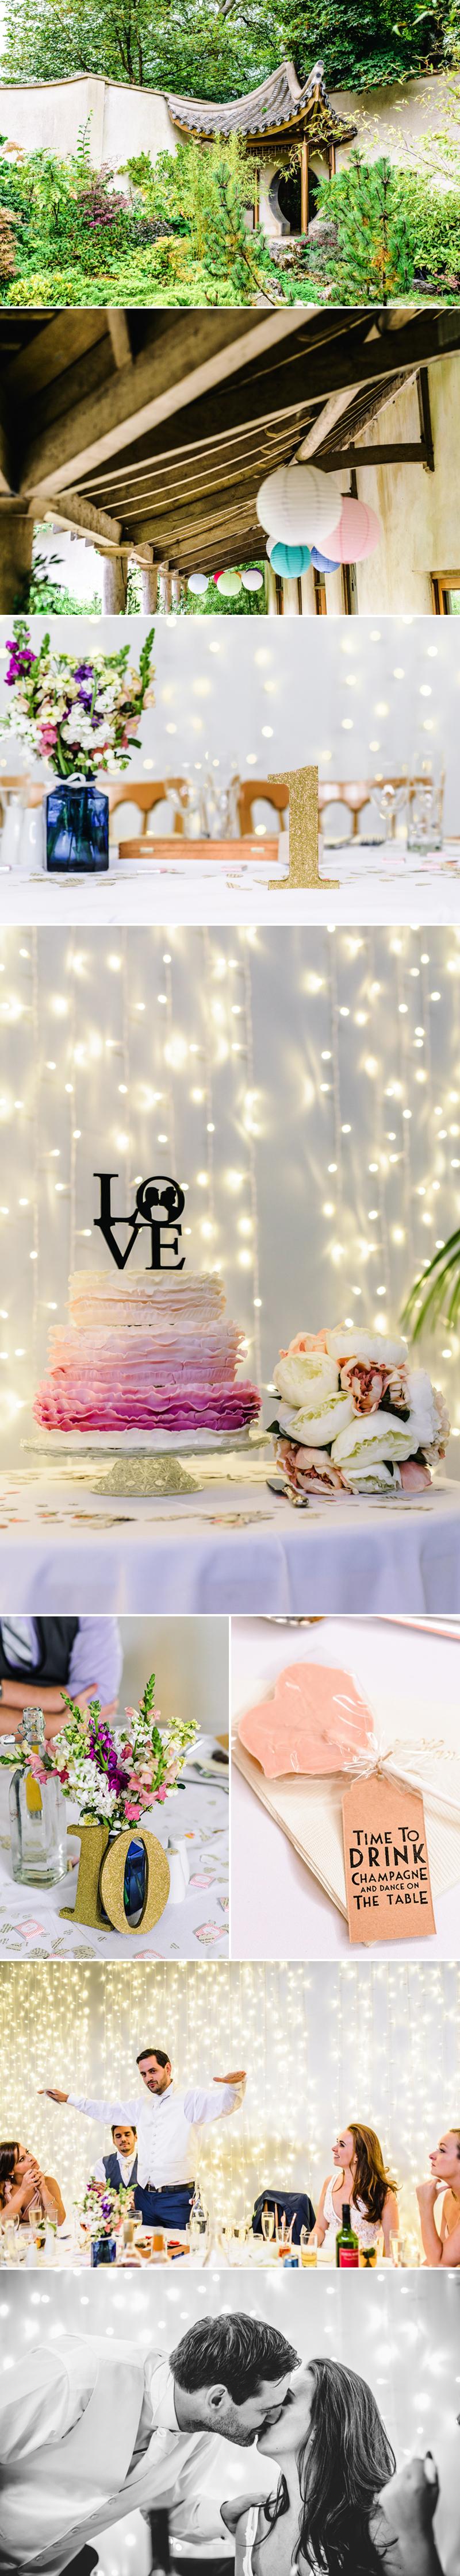 wedding-venues-in-gloucestershire-matara-centre-big-eye-photography-005